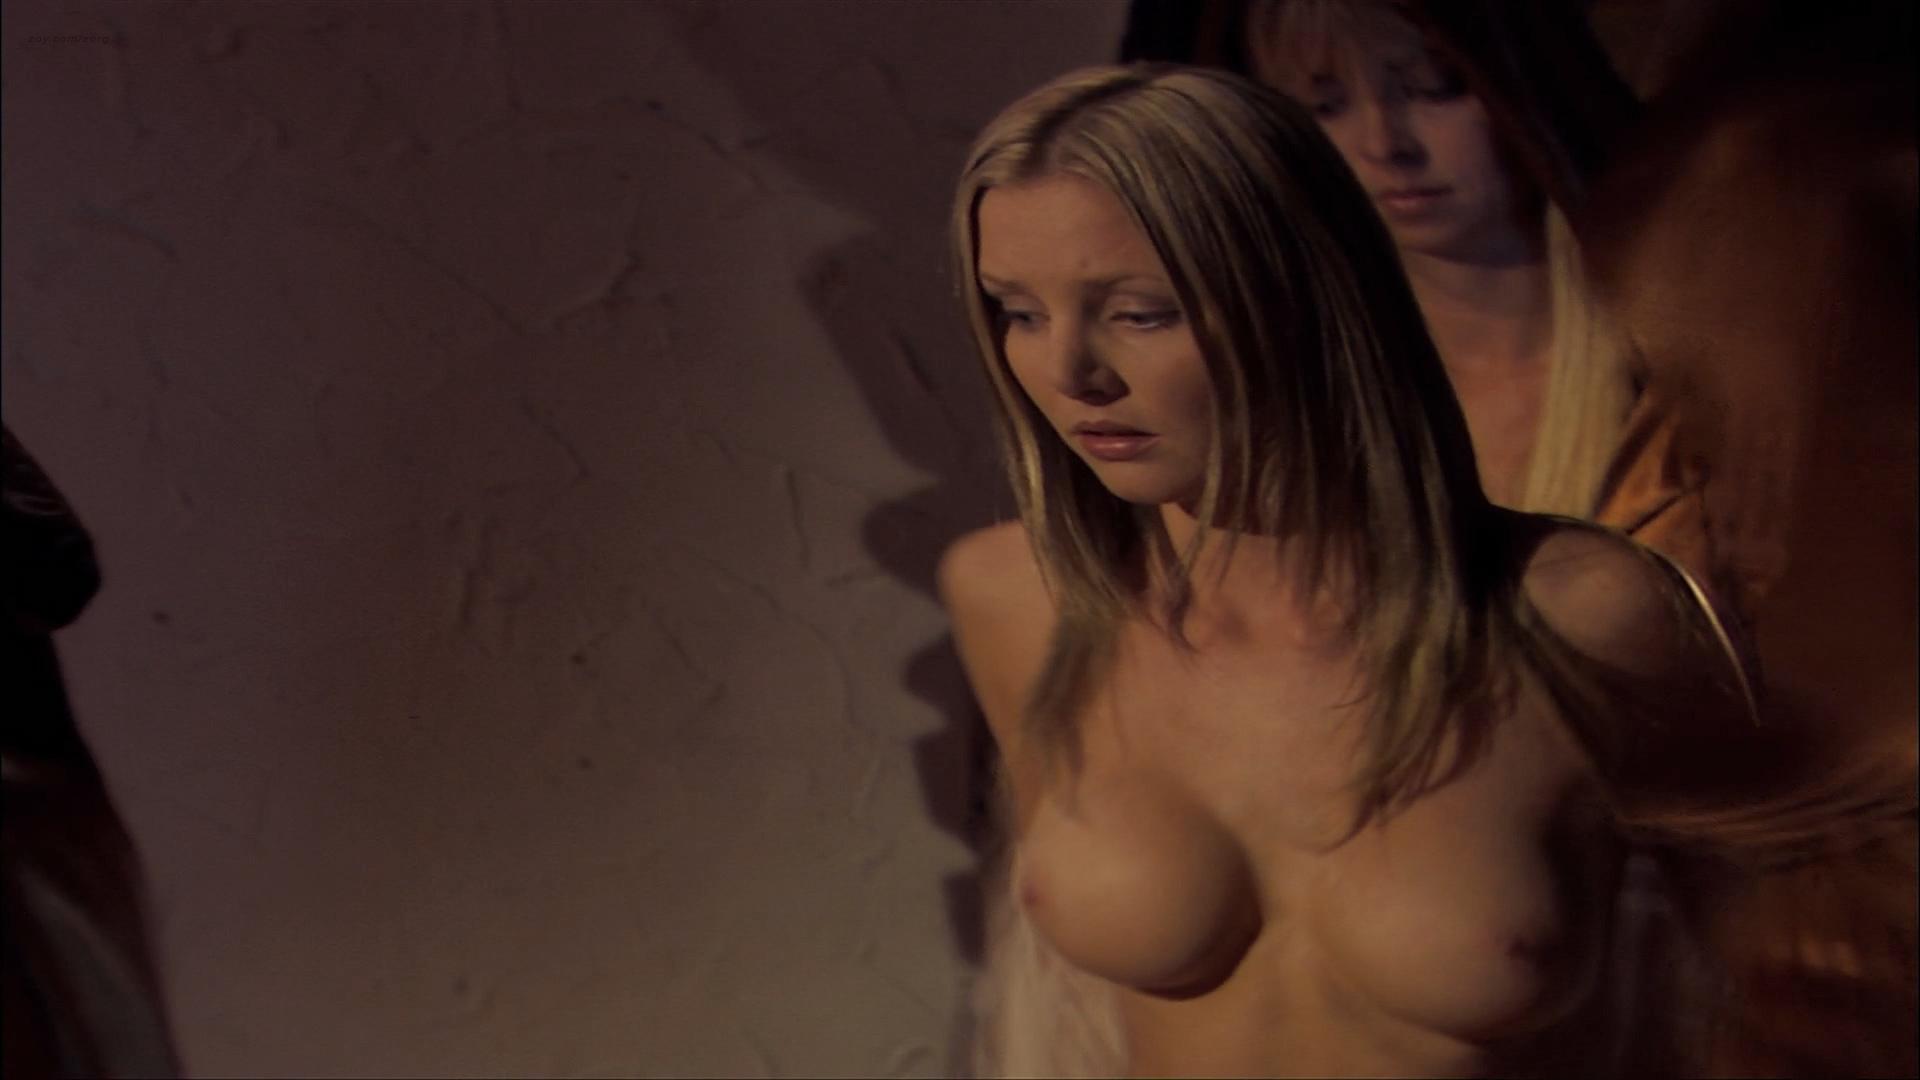 Shawna waldron nude